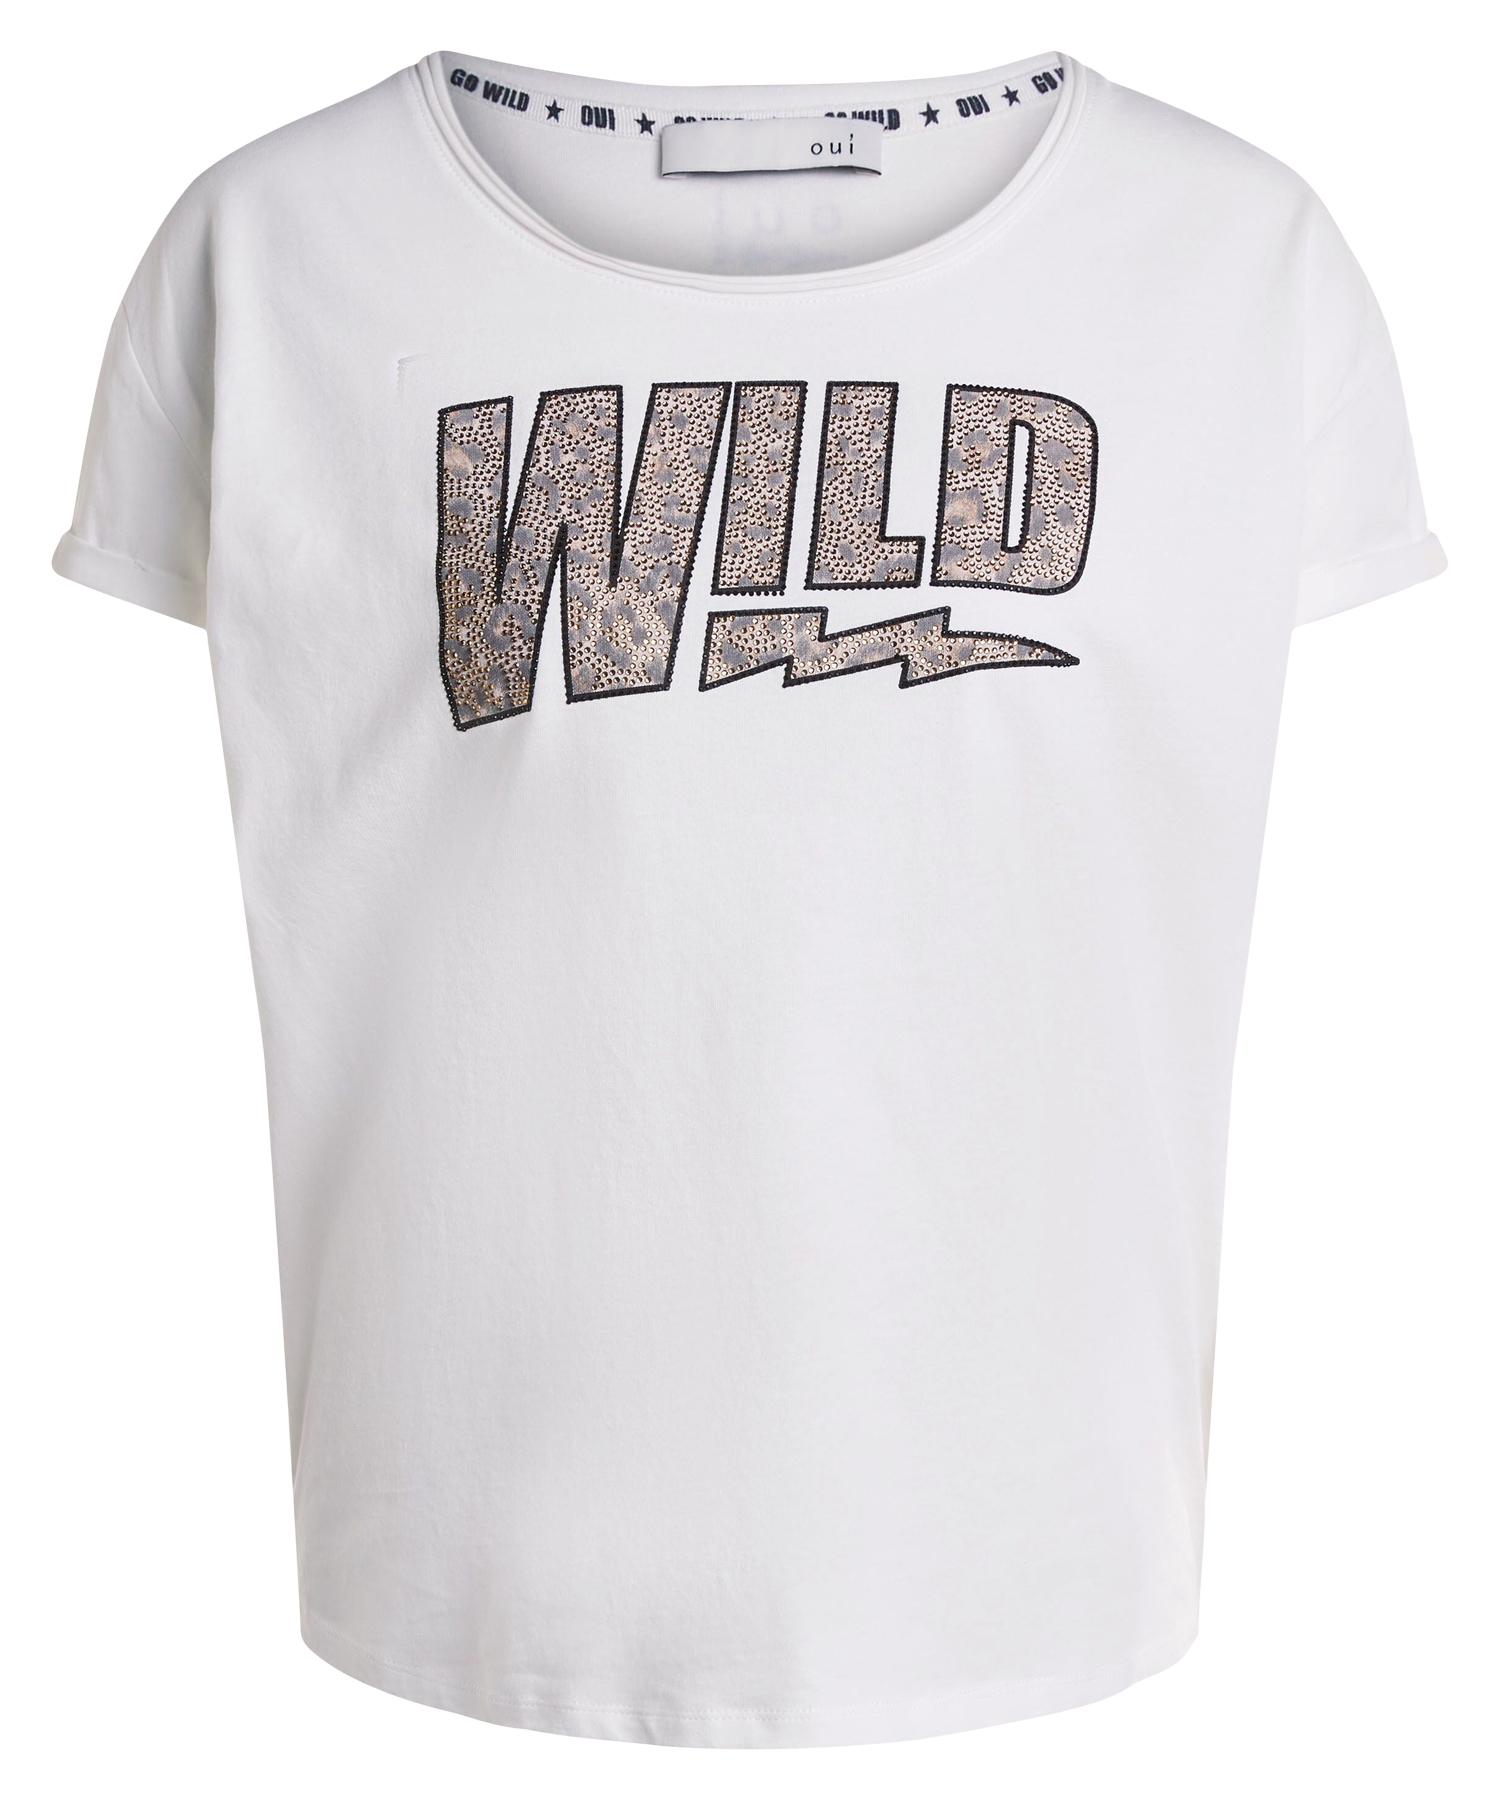 Oui shirt 'Wild'